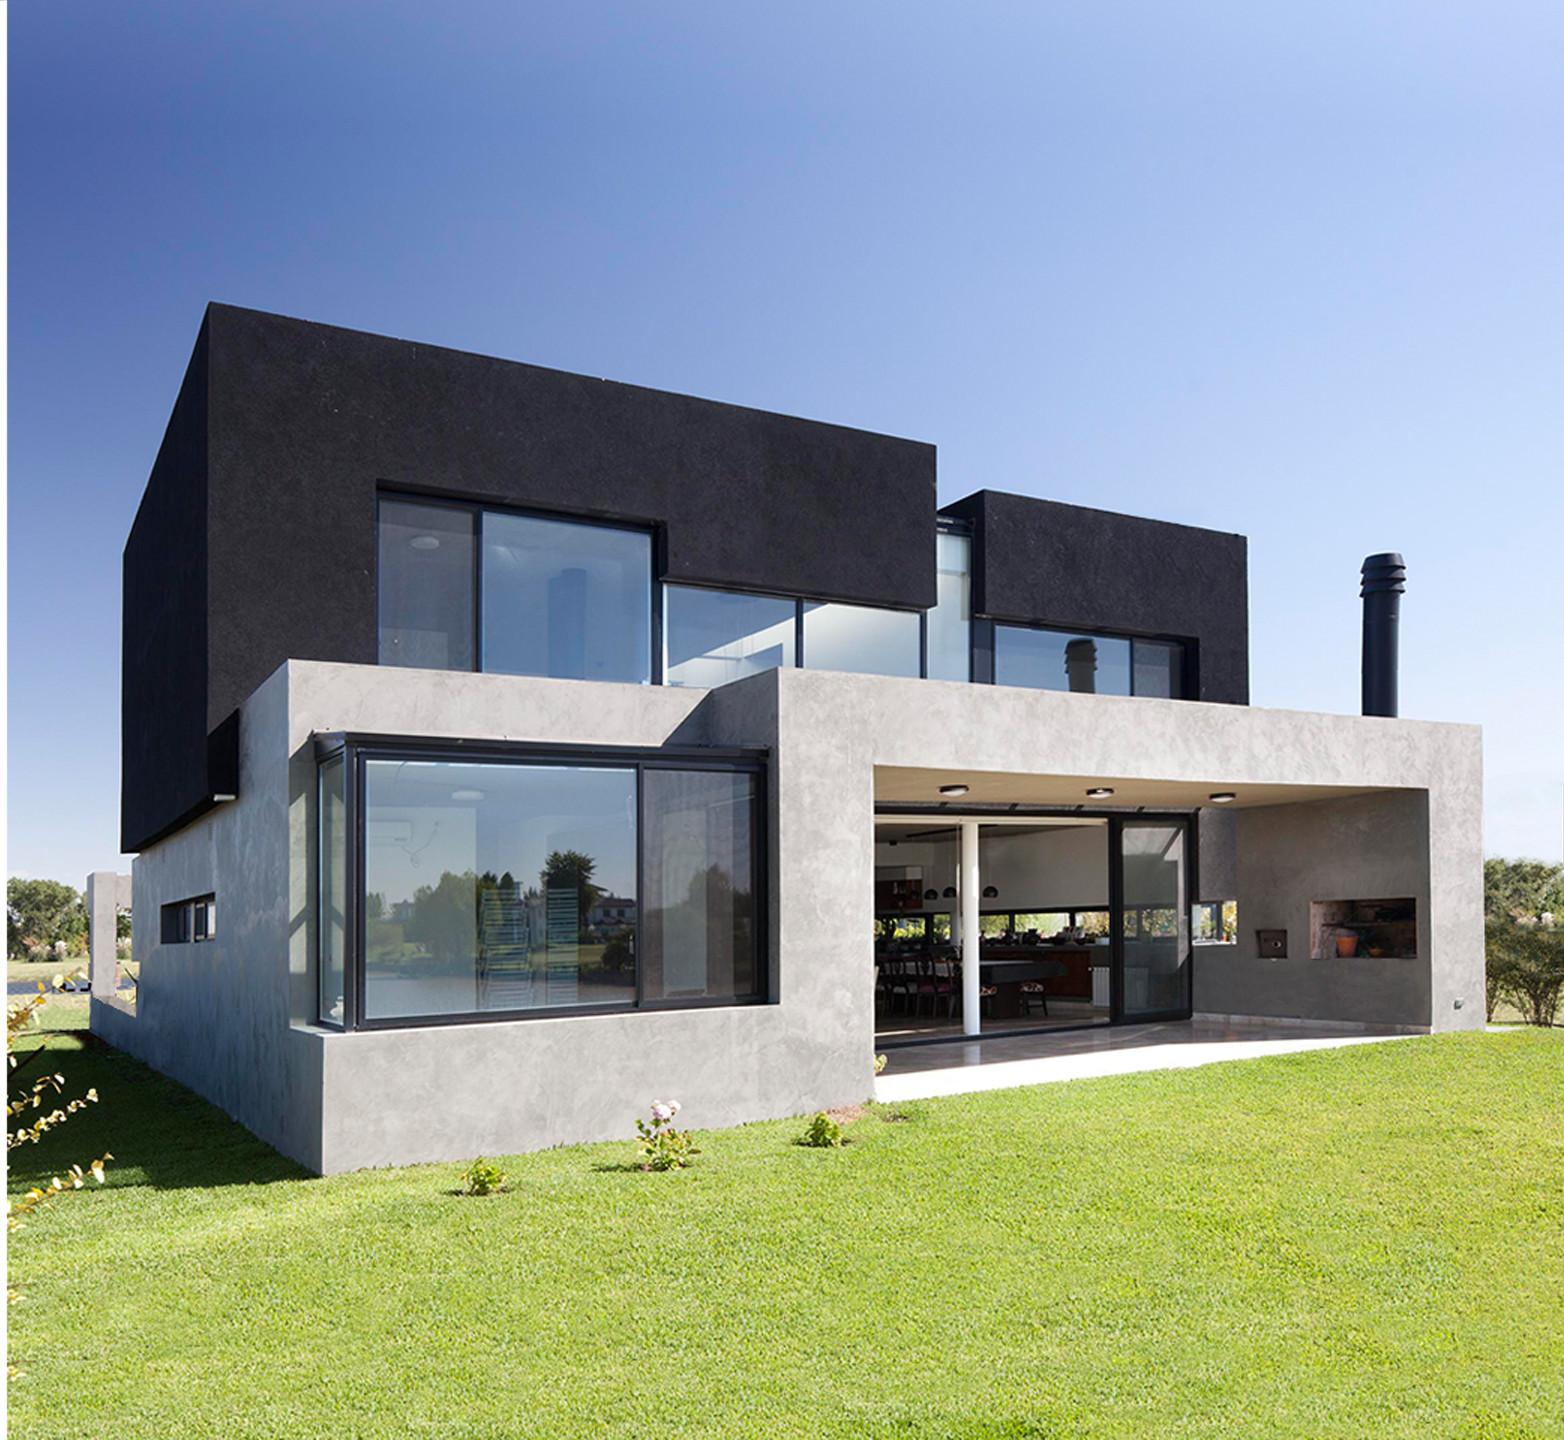 Galeria de casa jg speziale linares arquitectos 8 for Casa de arquitectos